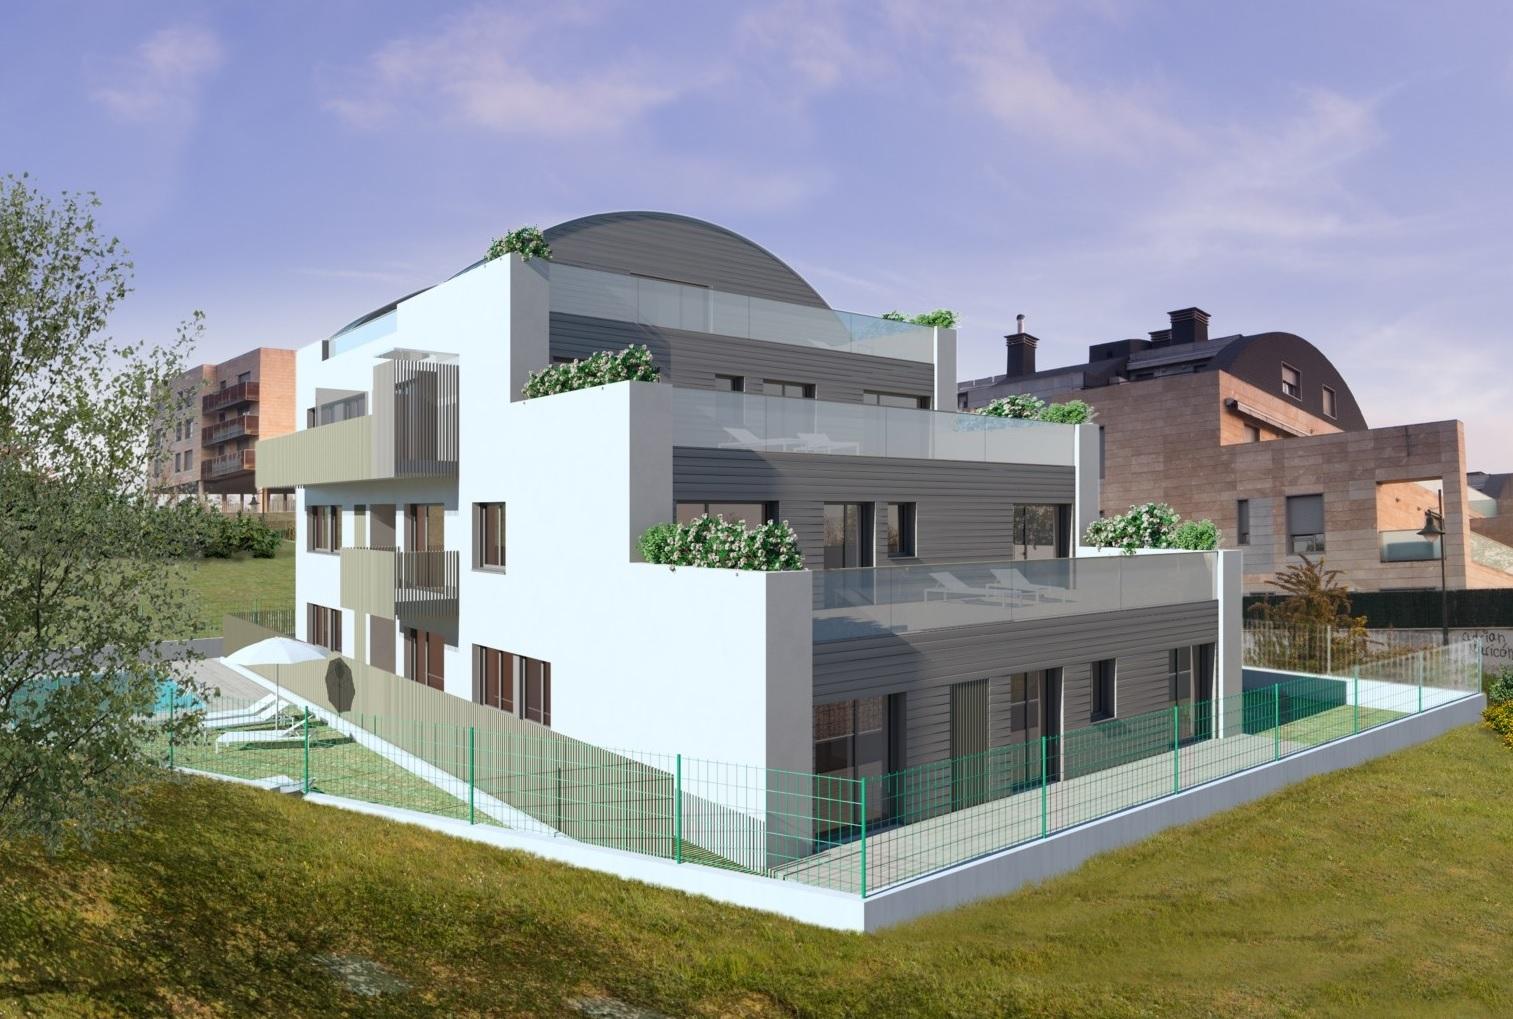 Promoci n obra nueva en viesques arm inmobiliaria gijon - Pisos de obra nueva en gijon ...